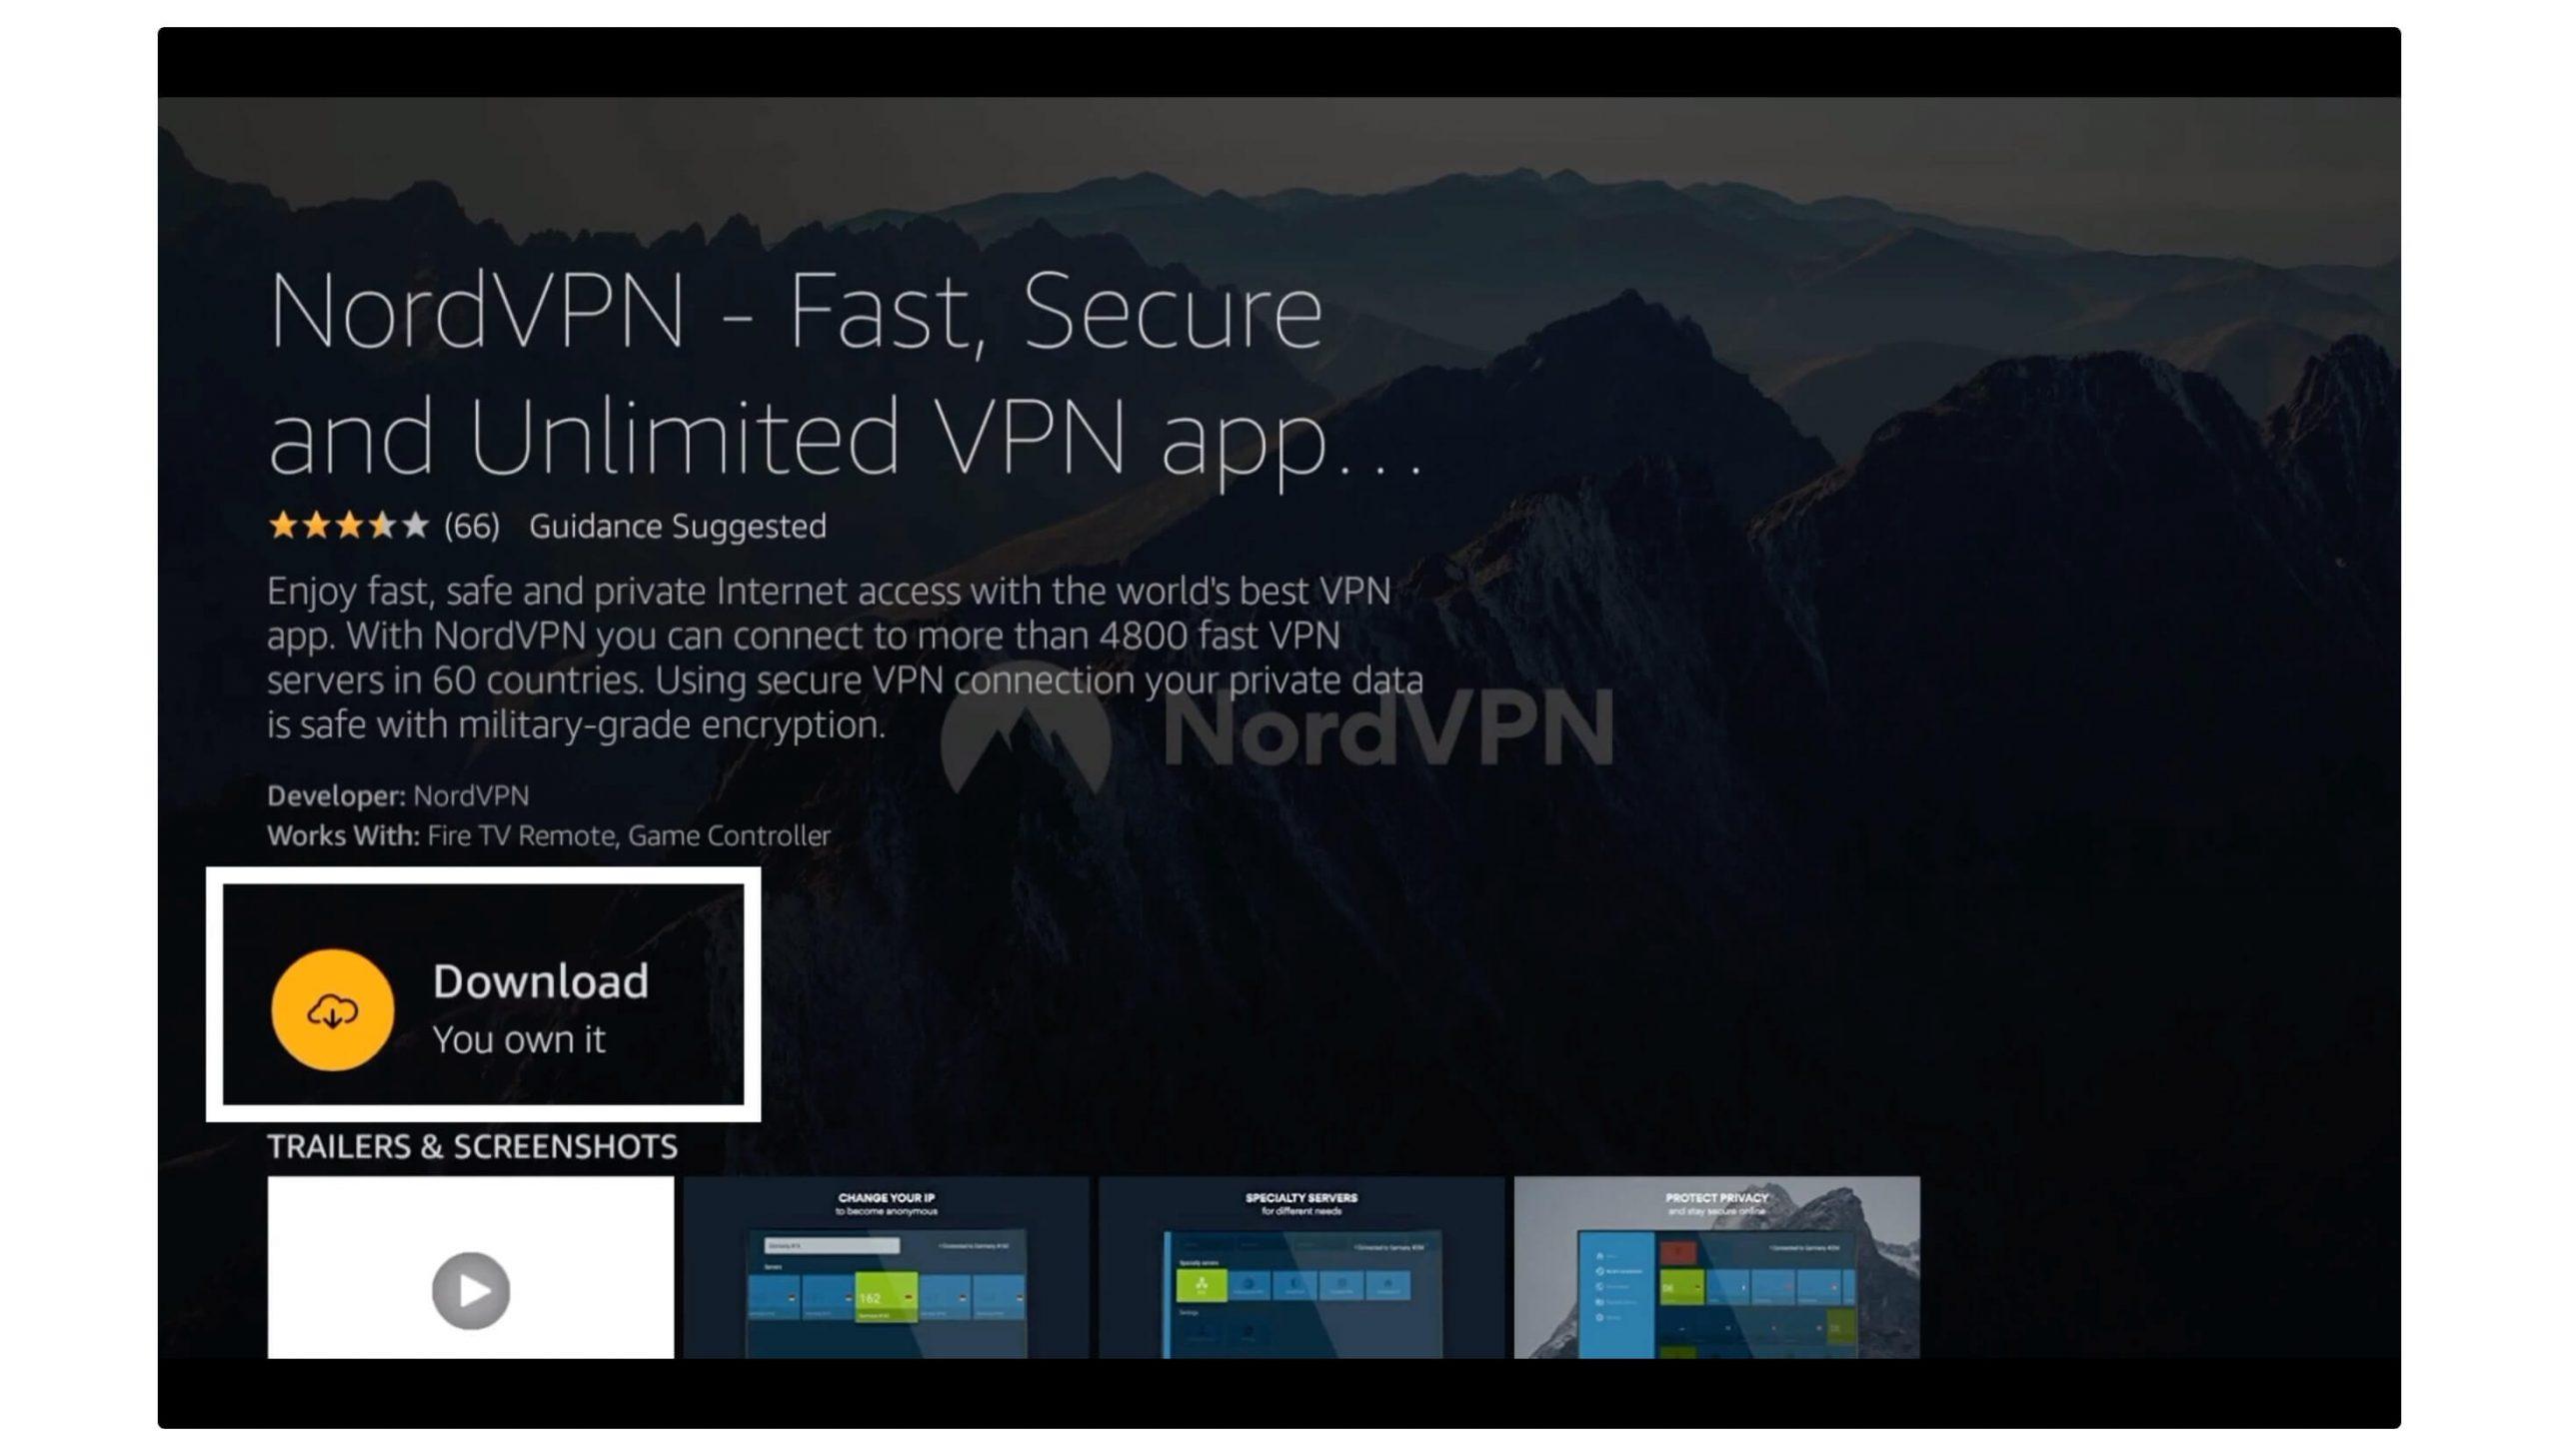 nstall-NordVPN-On-Firestick-Device